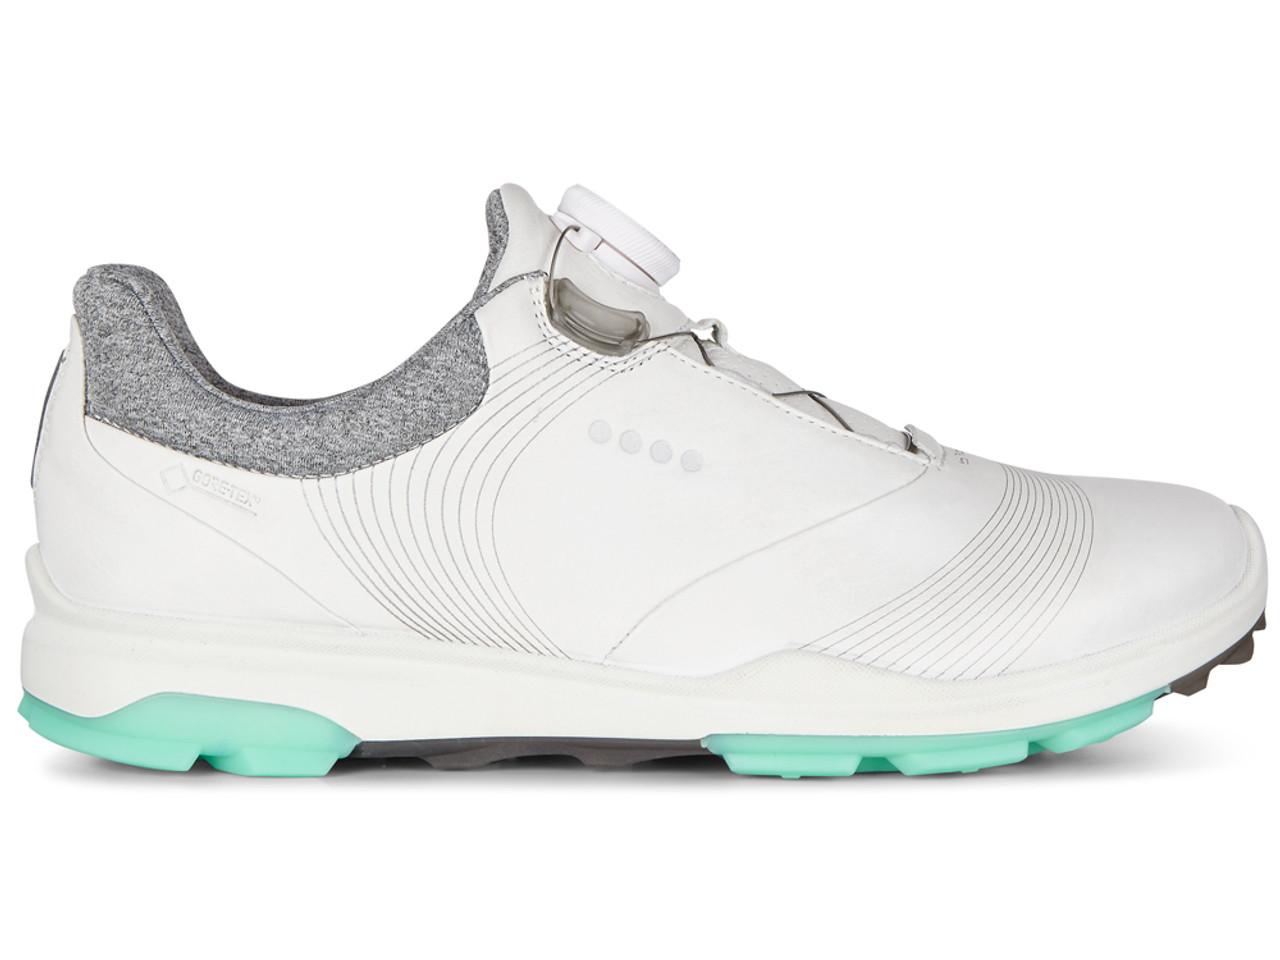 e17256bb9816 Ecco W Biom Golf Club Hybrid 3 BOA Golf Shoes - White Emerald ...